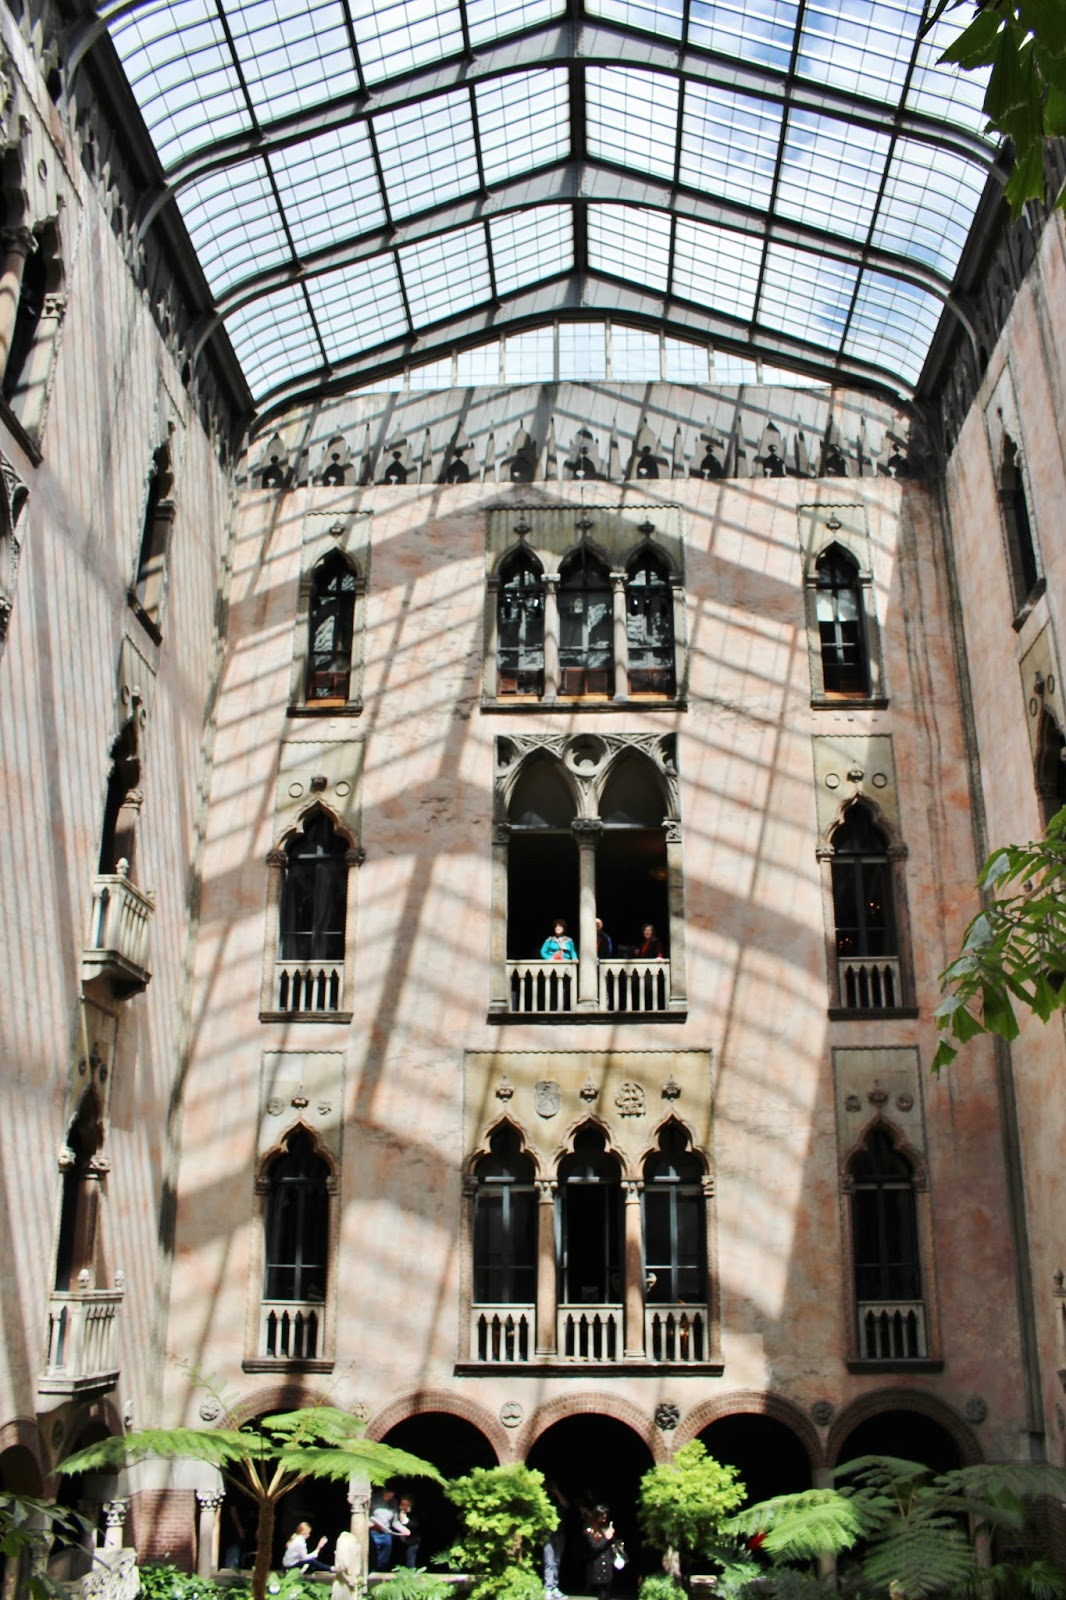 bijuleni - Isabella Gardner Museum Architecture, Boston